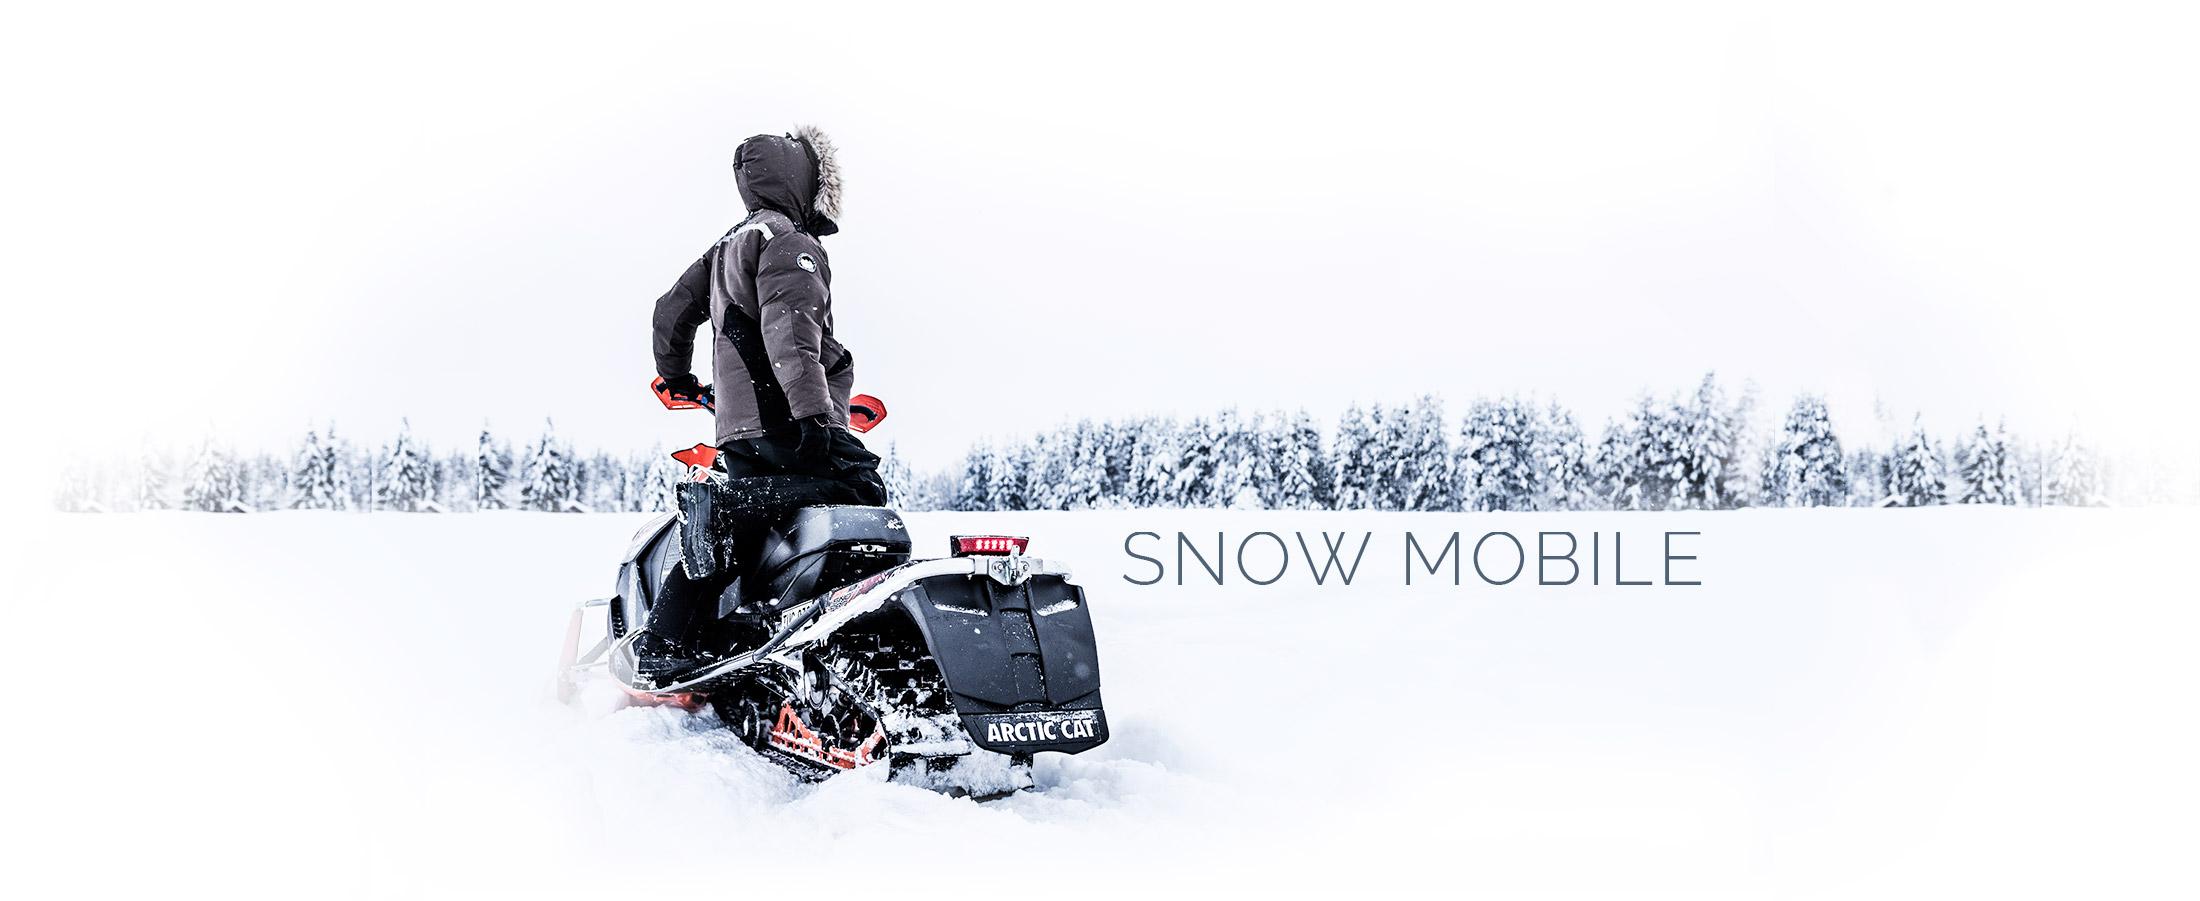 Snow Mobile safaris